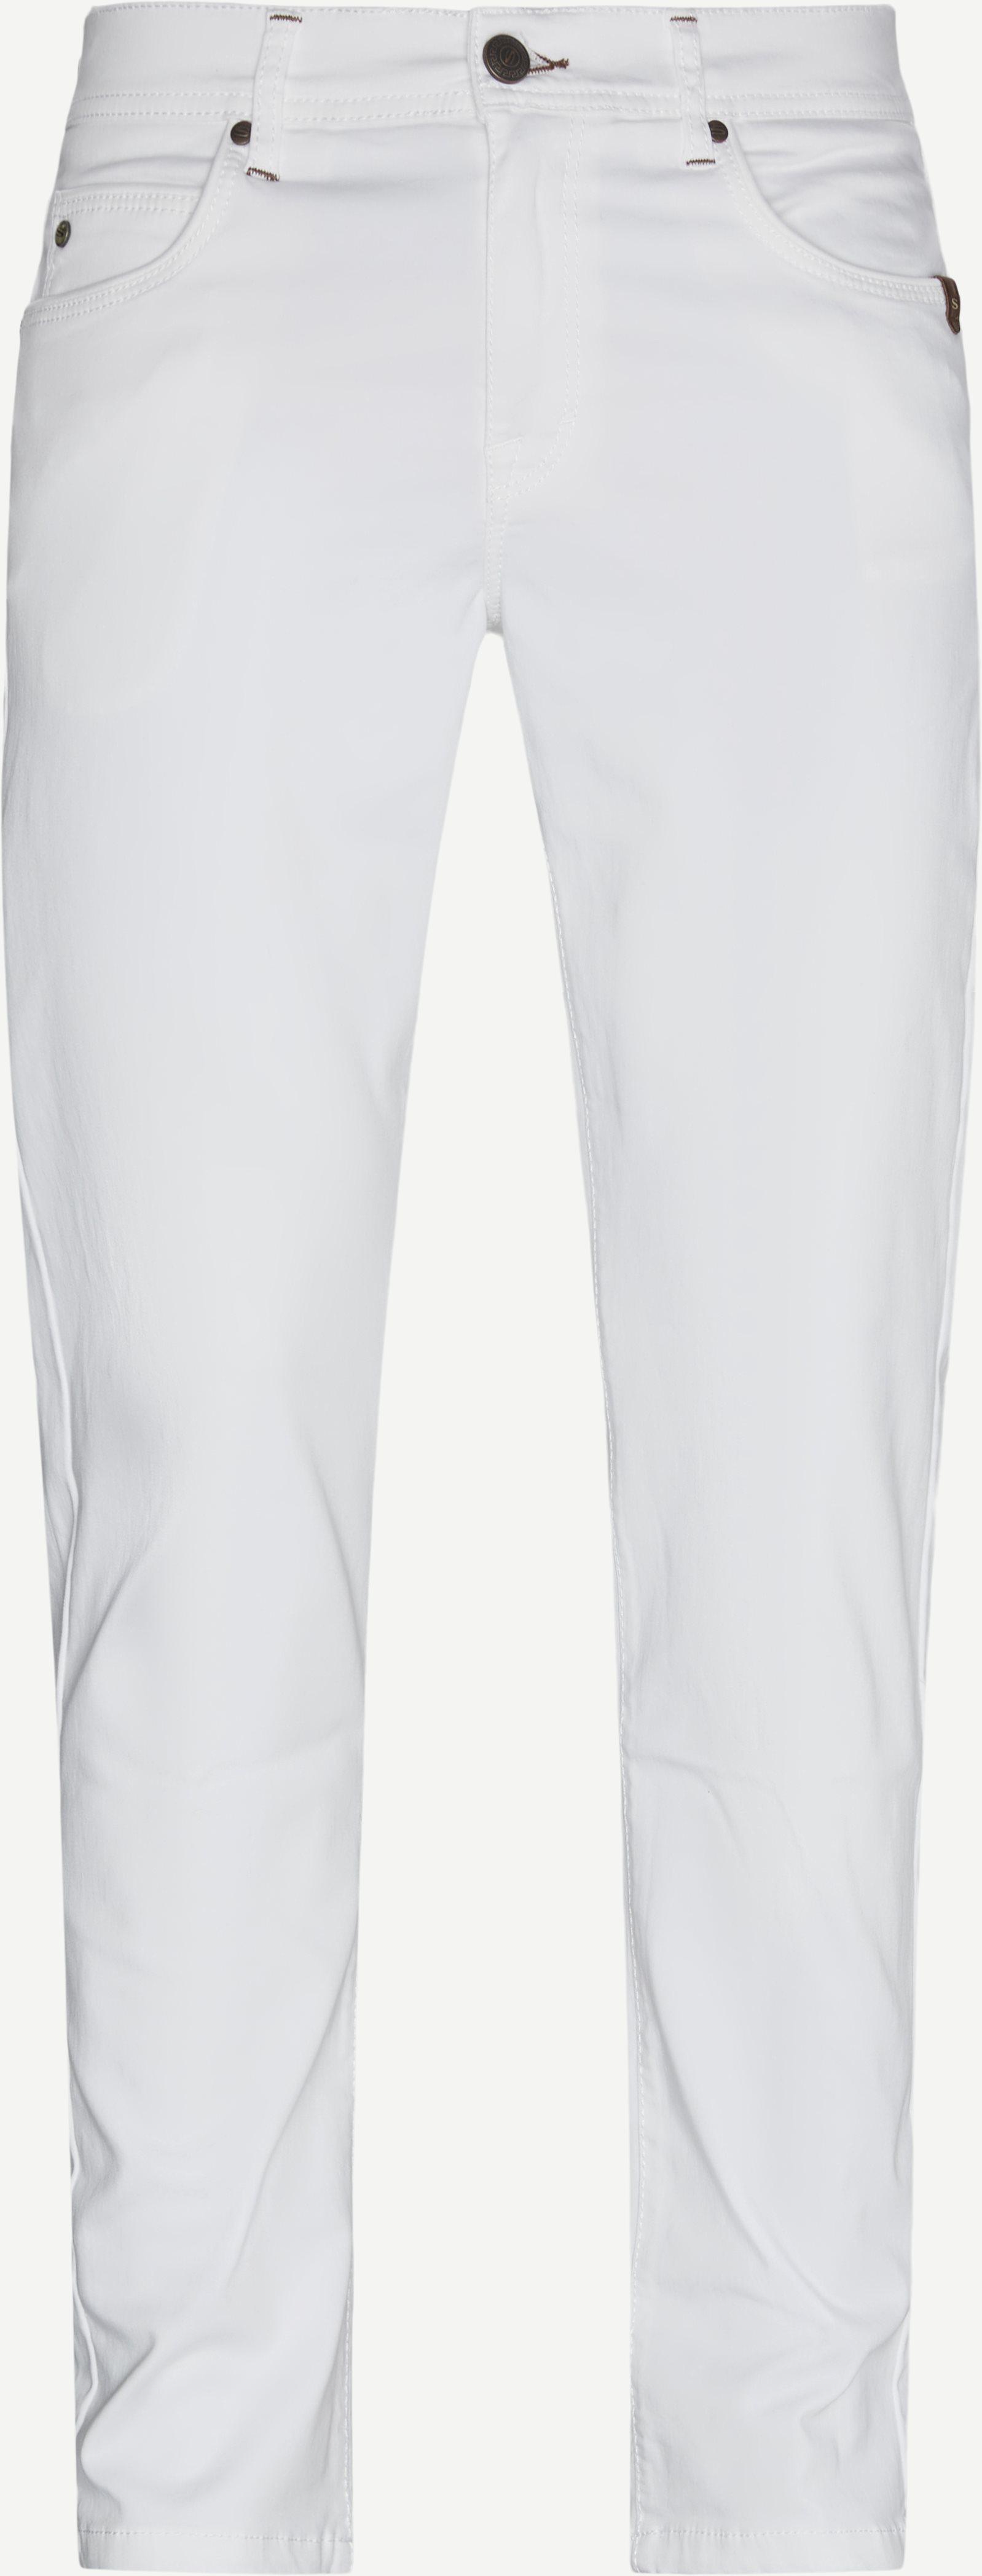 Jeans - Vit